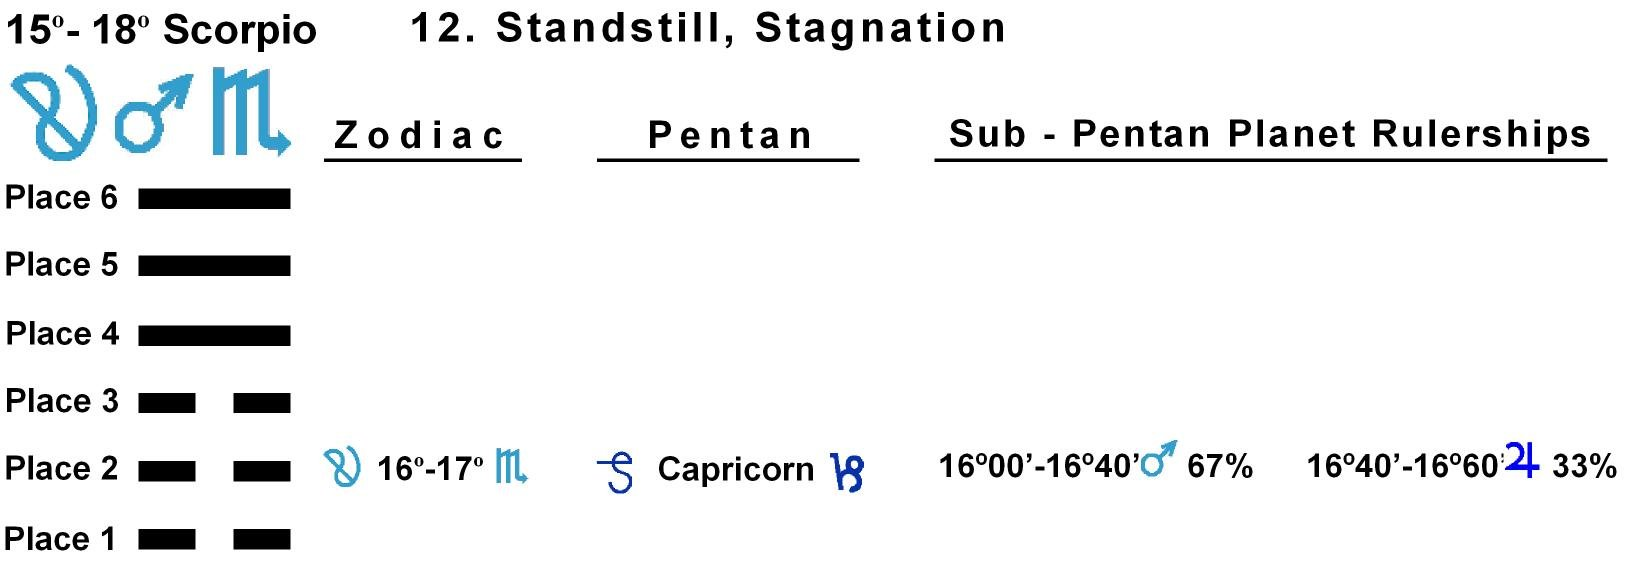 Pent-lines-08SC 16-17 Hx-12 Standstill